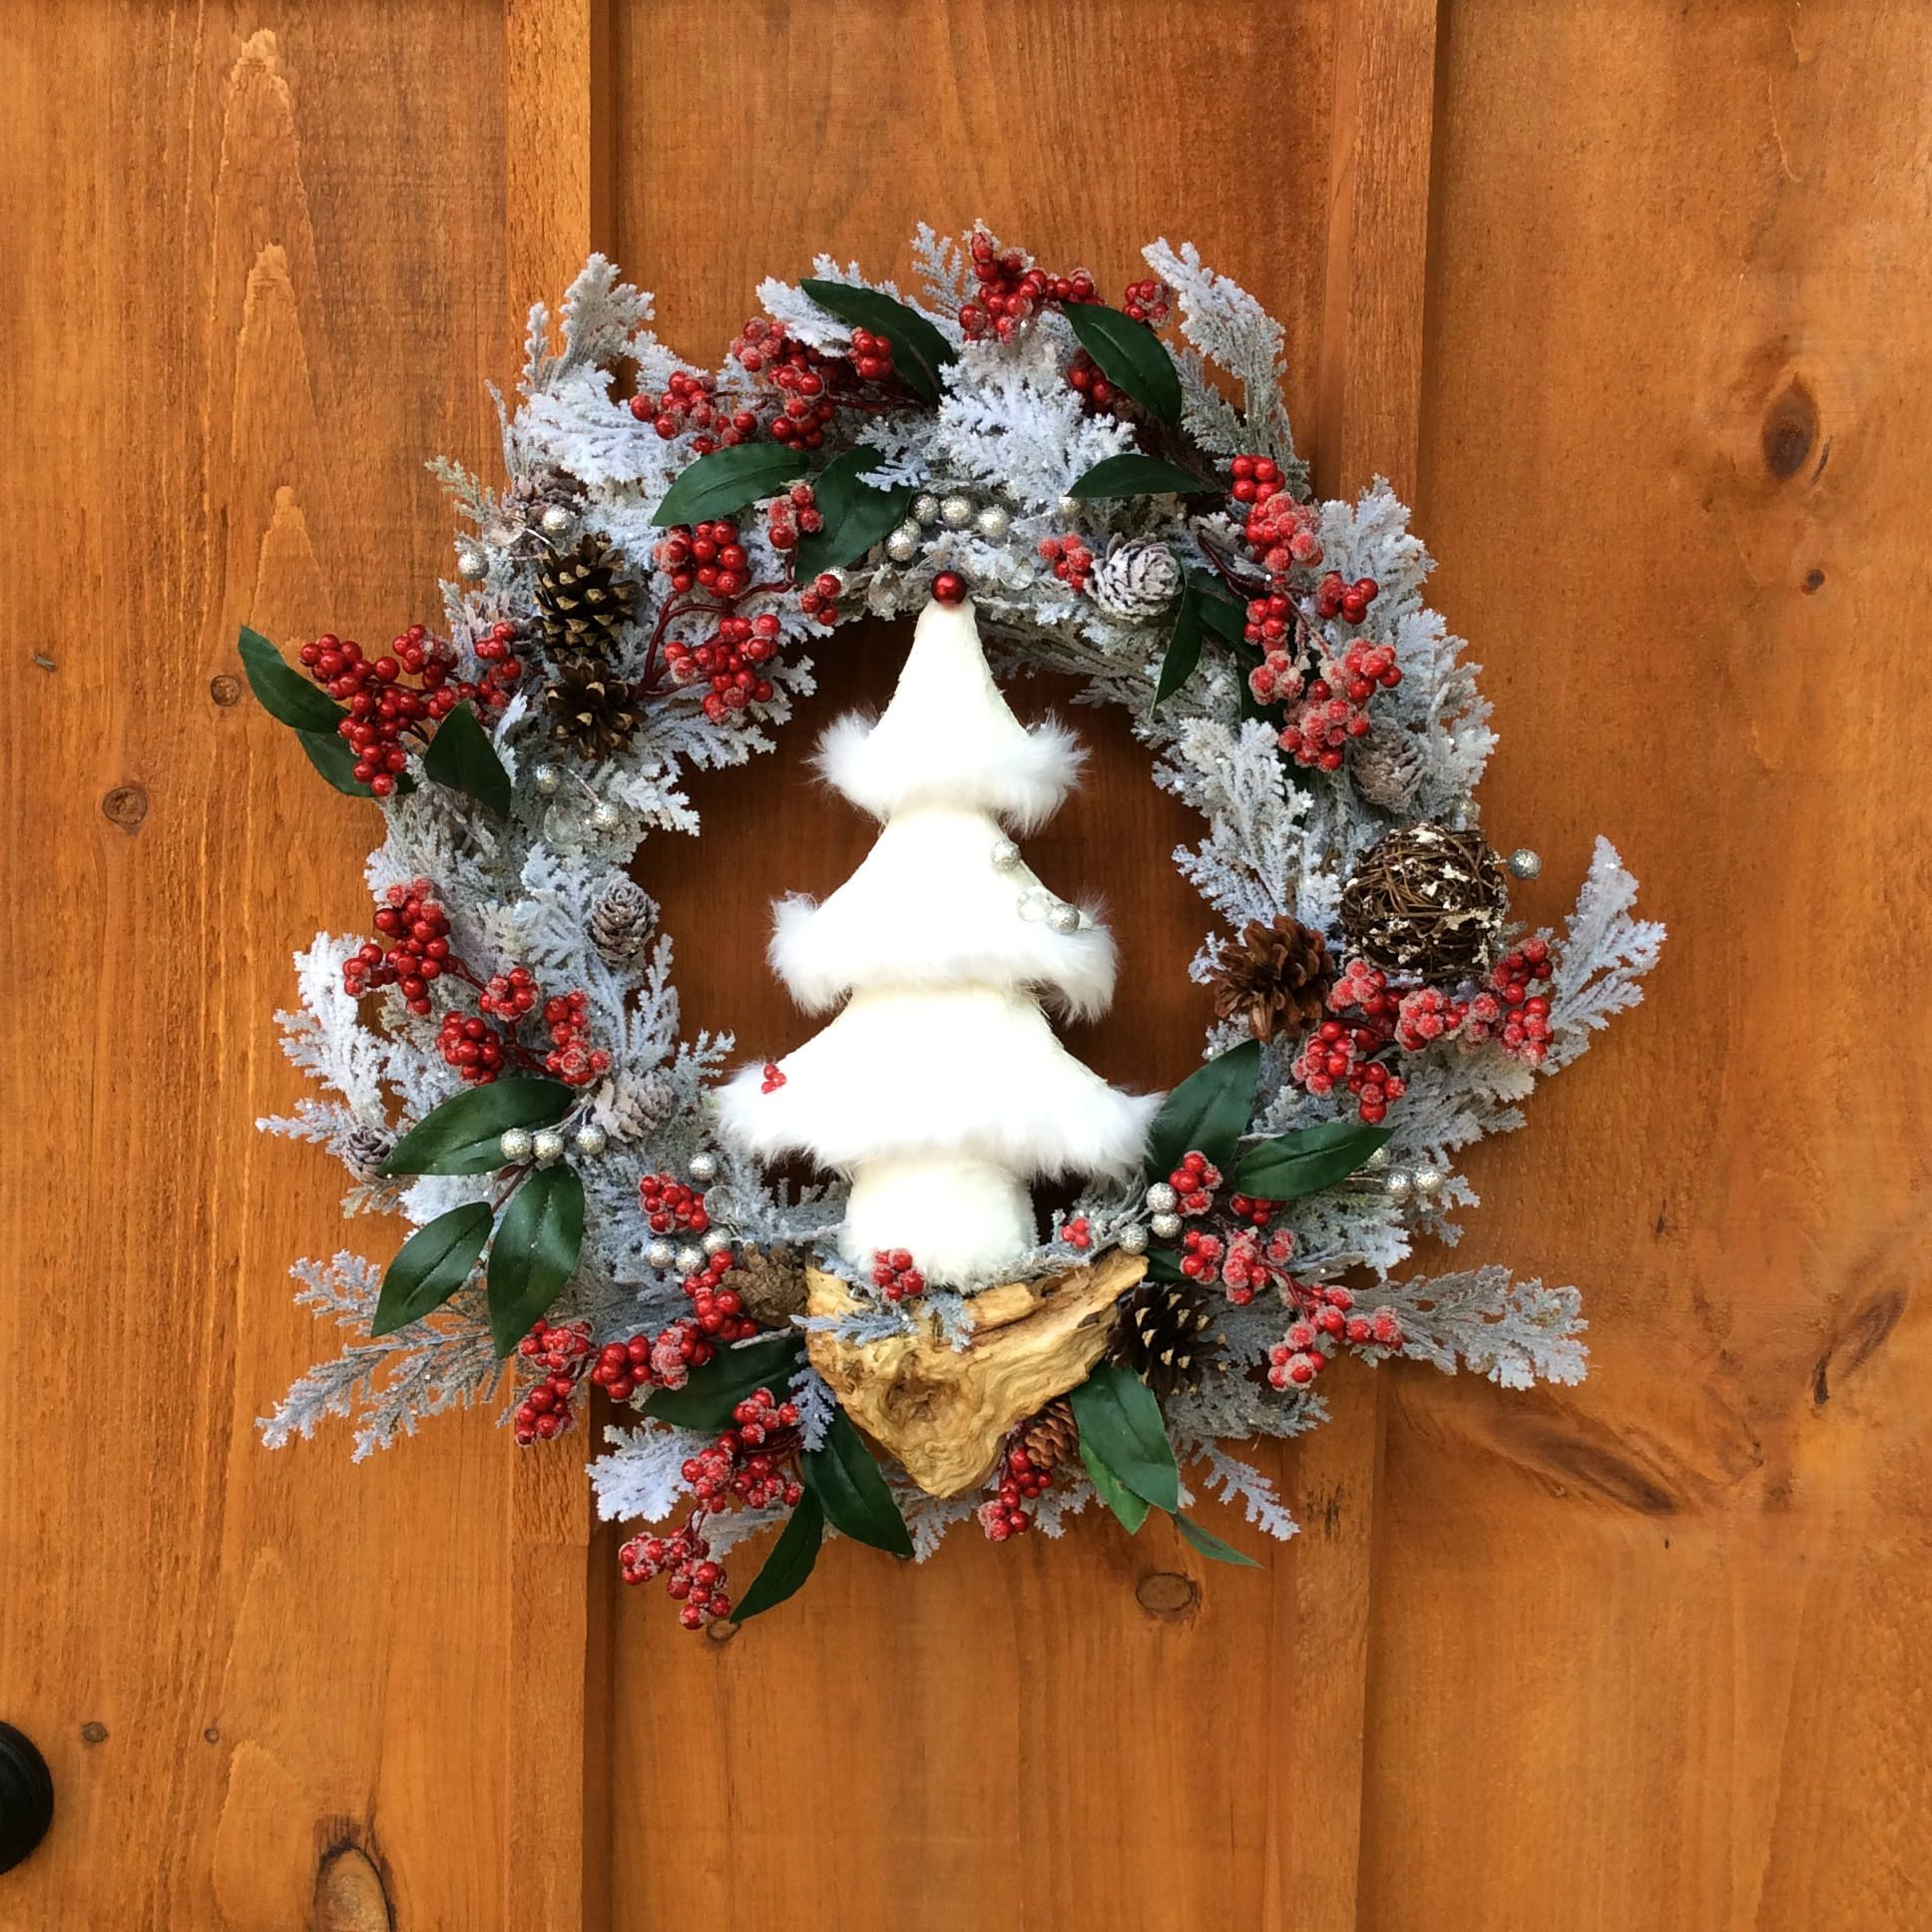 White Christmas Tree Winter Wreath 21inch Christmas Wreath Winter Wreath Front Door Decor Handmade Wreath Unique Made In Canada Christmas Wreaths Handmade Christmas Tree Handmade Wreaths